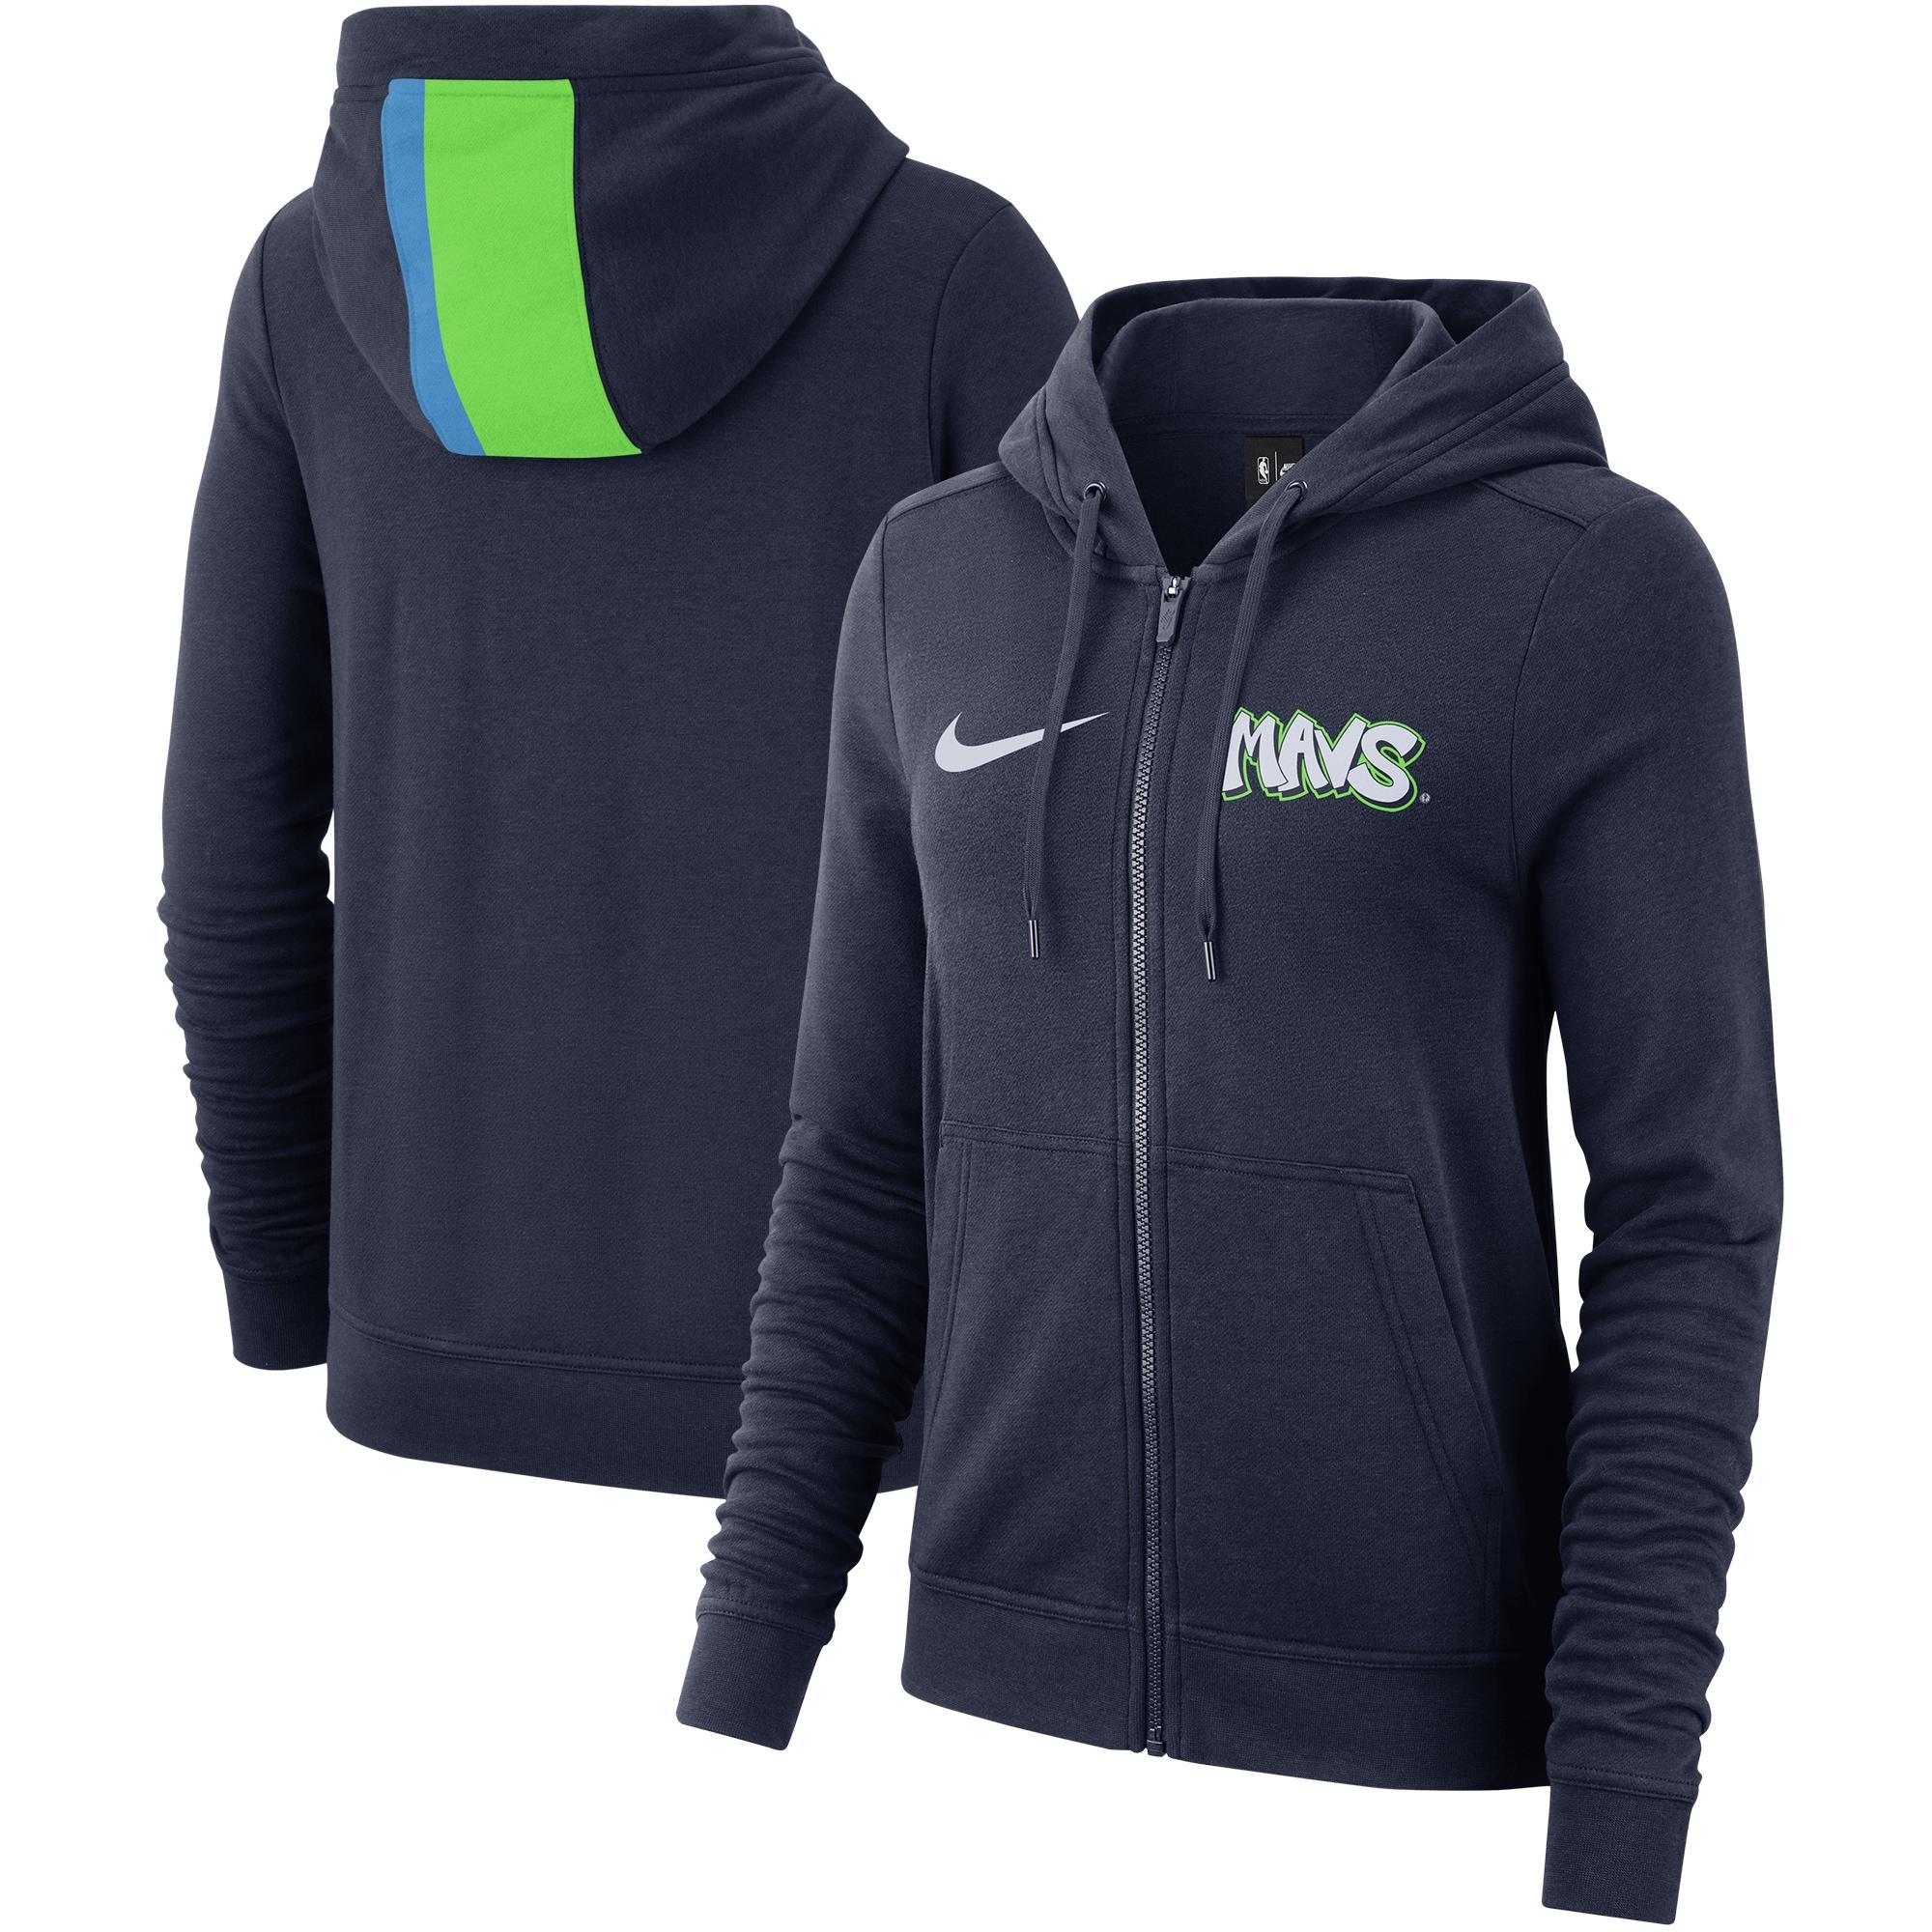 Dallas Mavericks Nike Women's 2019/20 City Edition Full-Zip Hoodie - Navy